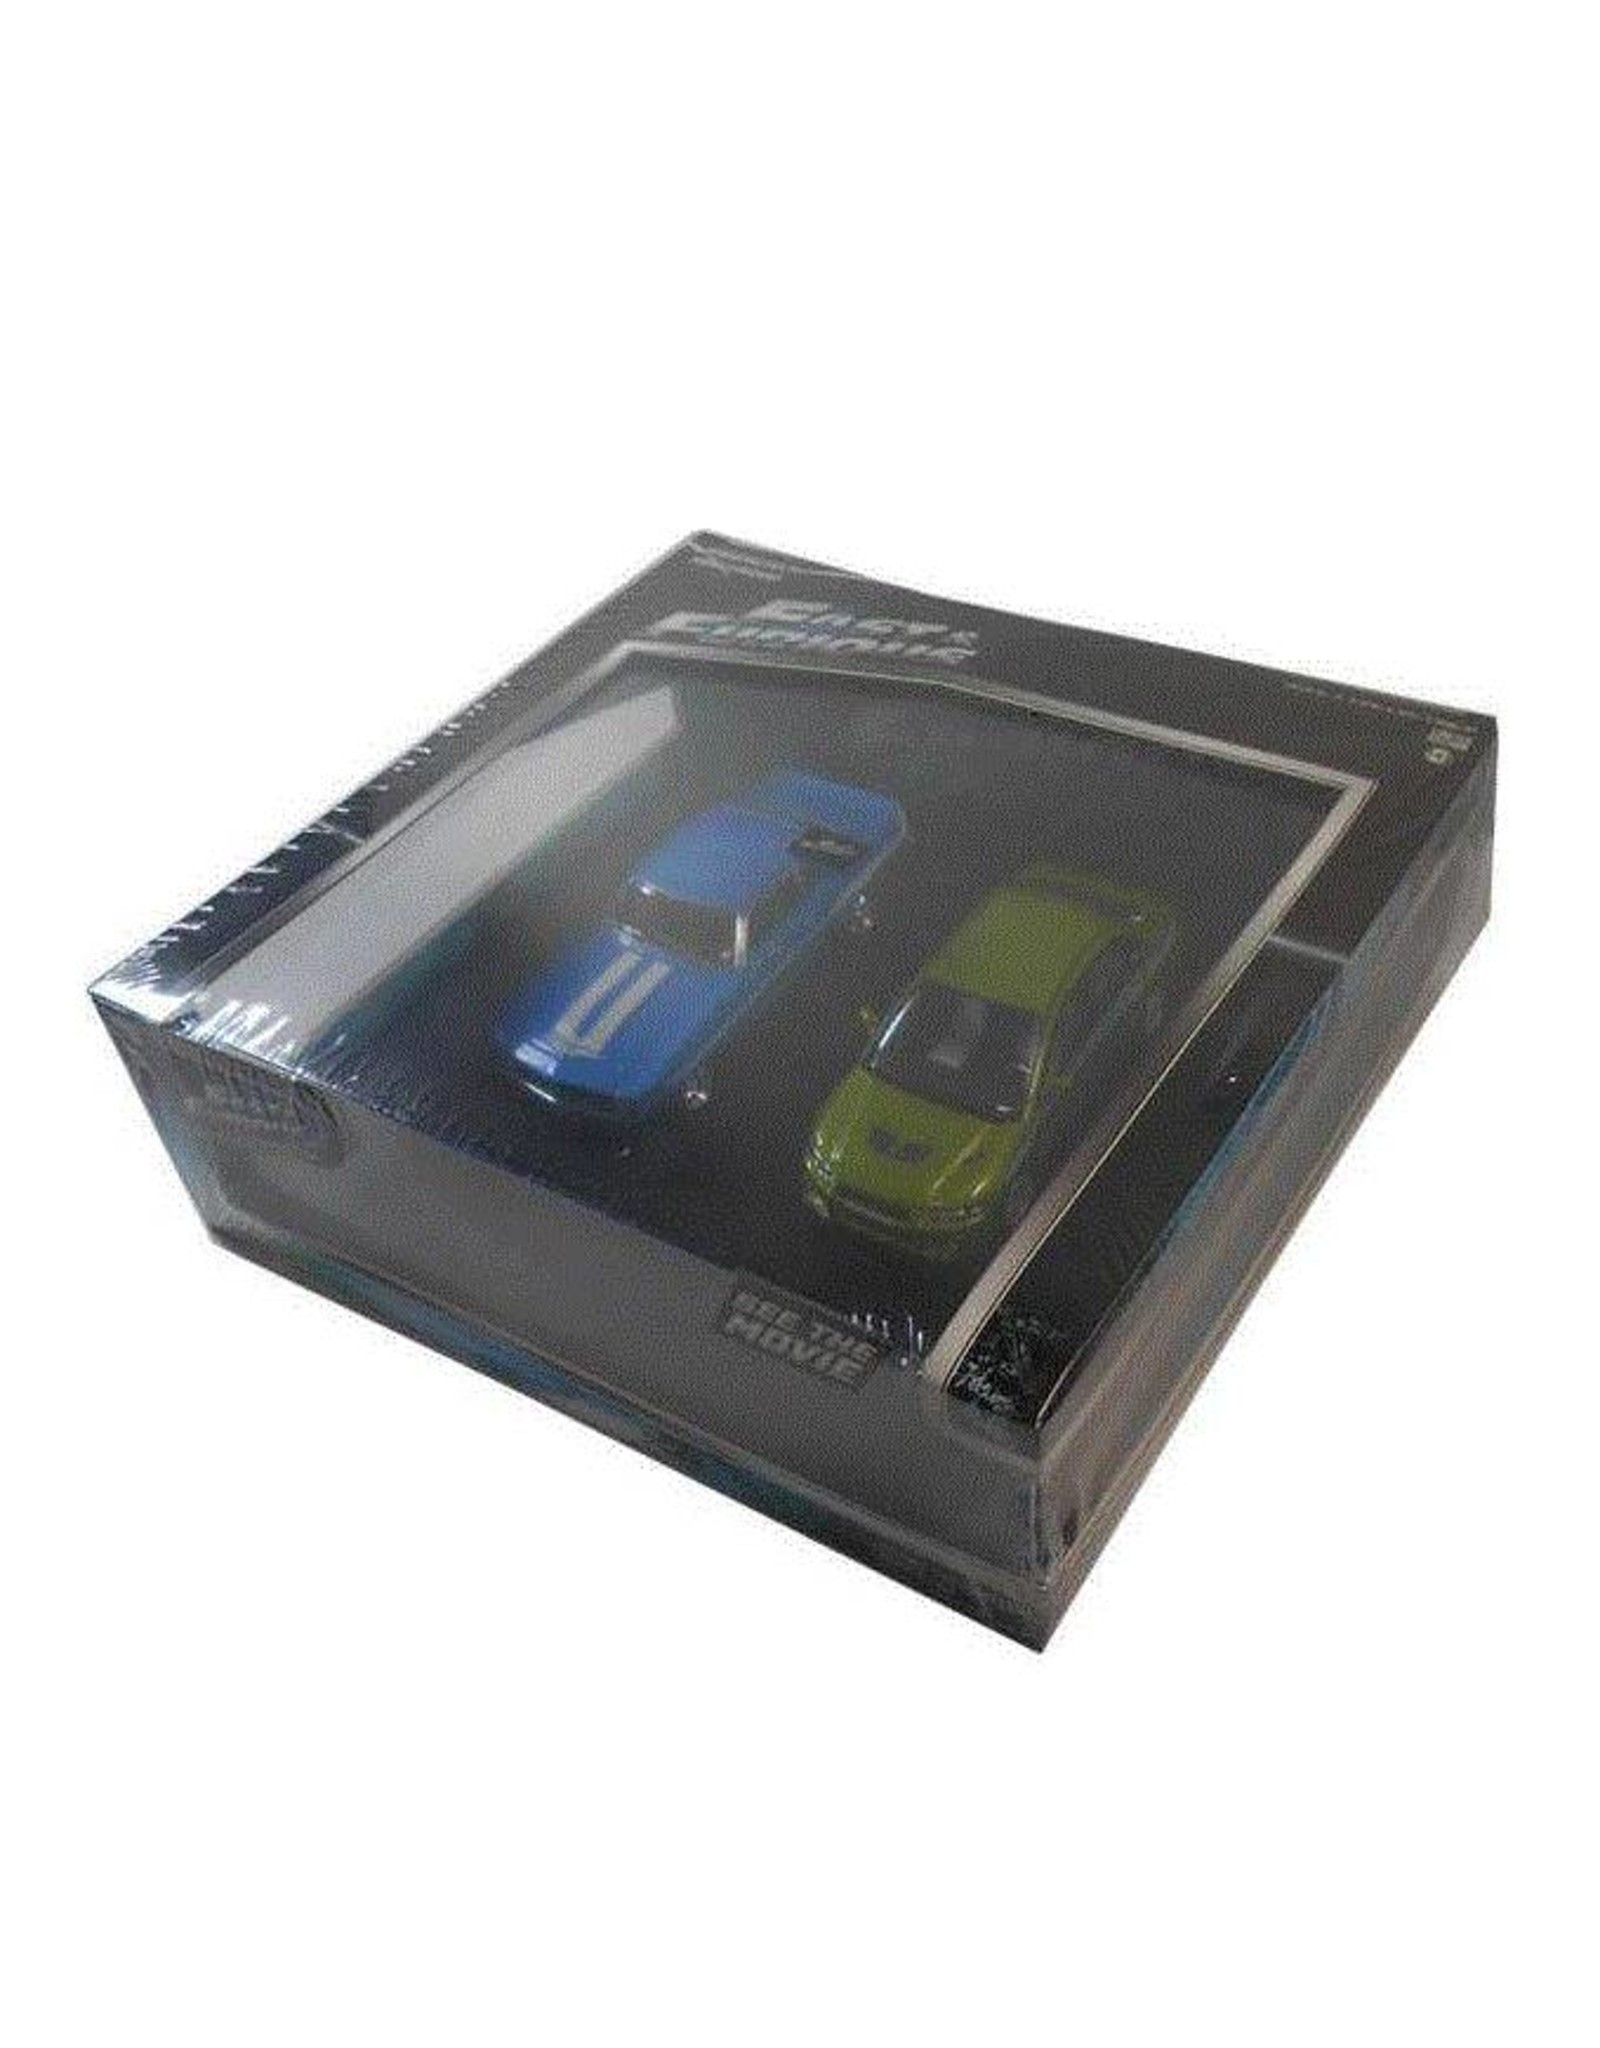 Movie Memorabilia Movie Memorabilia Fast and Furious Set: Chevrolet + Mitsubishi - 1:43 - Greenlight